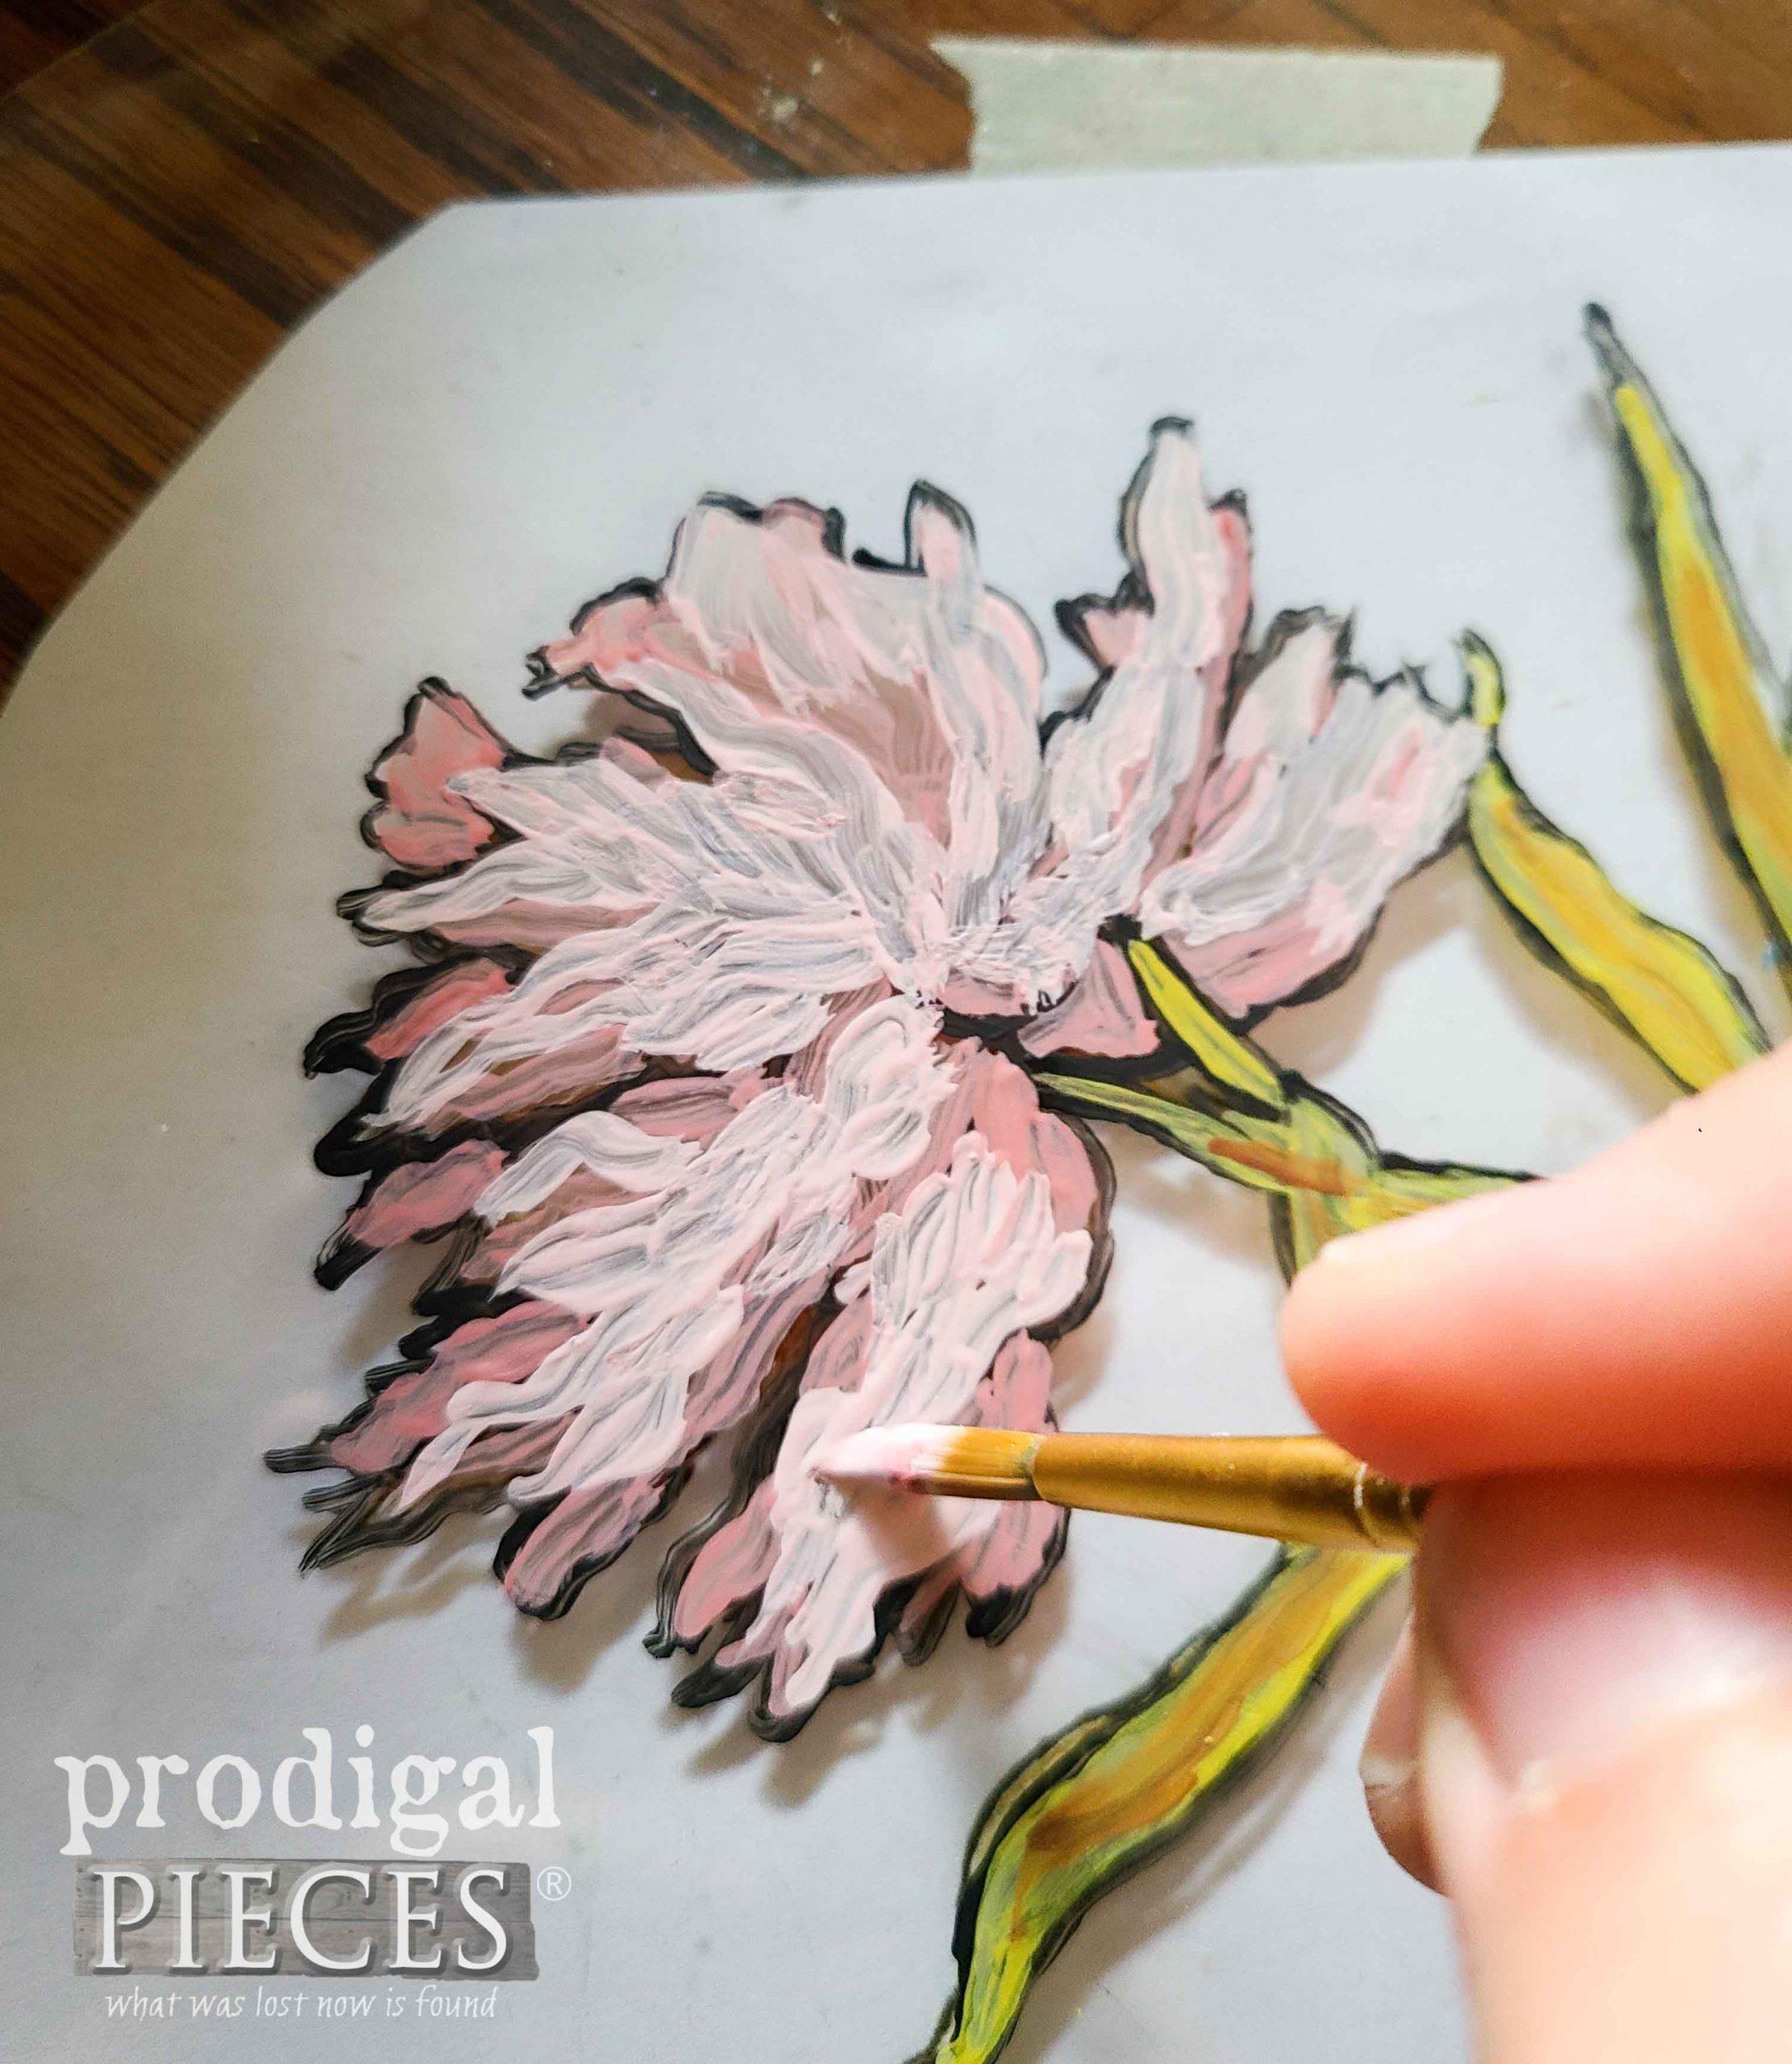 Painting Peony Flower on Glass | prodigalpieces.com #prodigalpieces